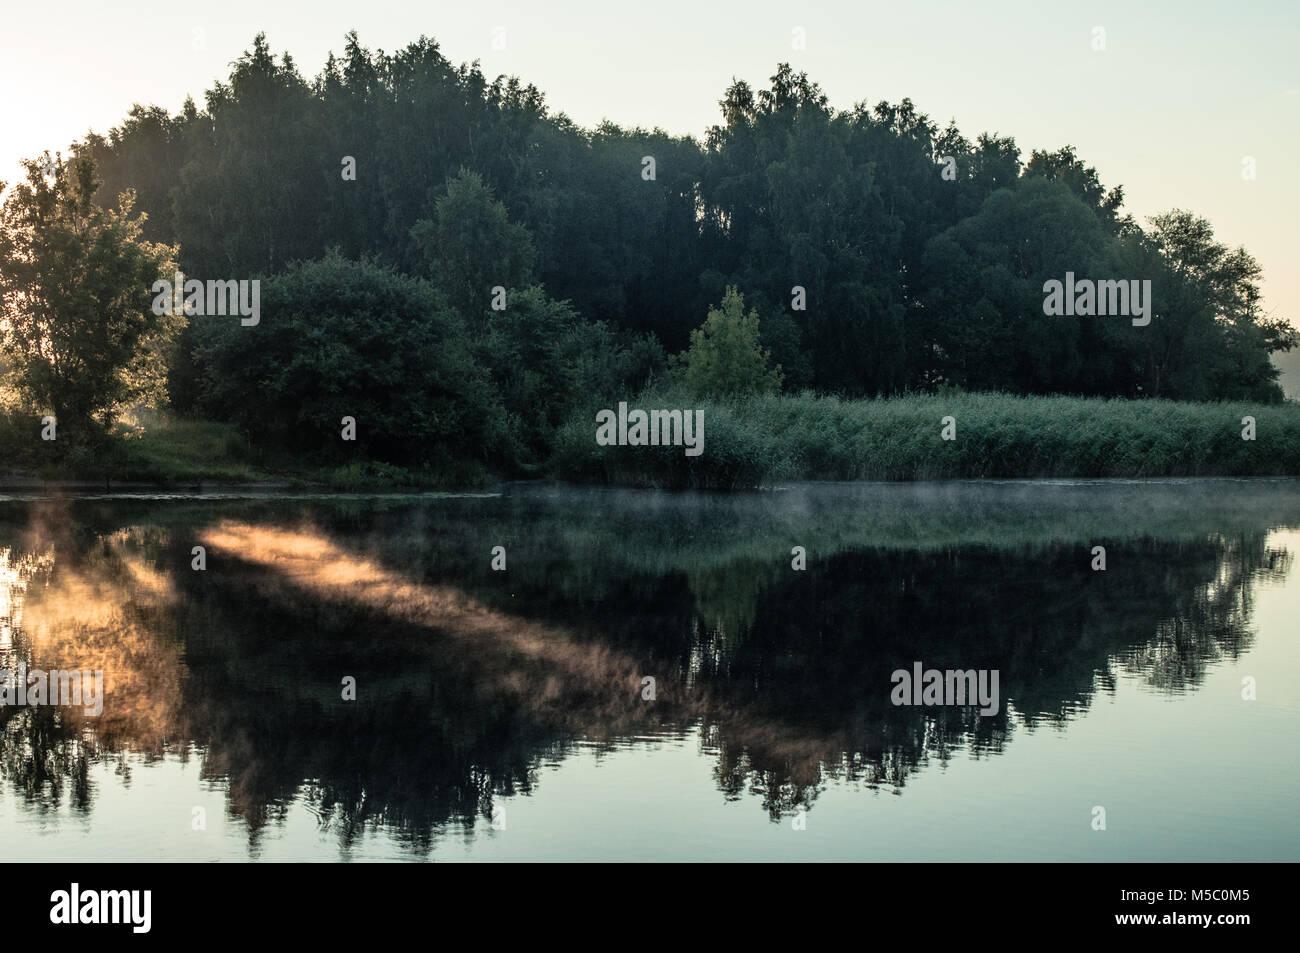 Lake in foggy morning. - Stock Image